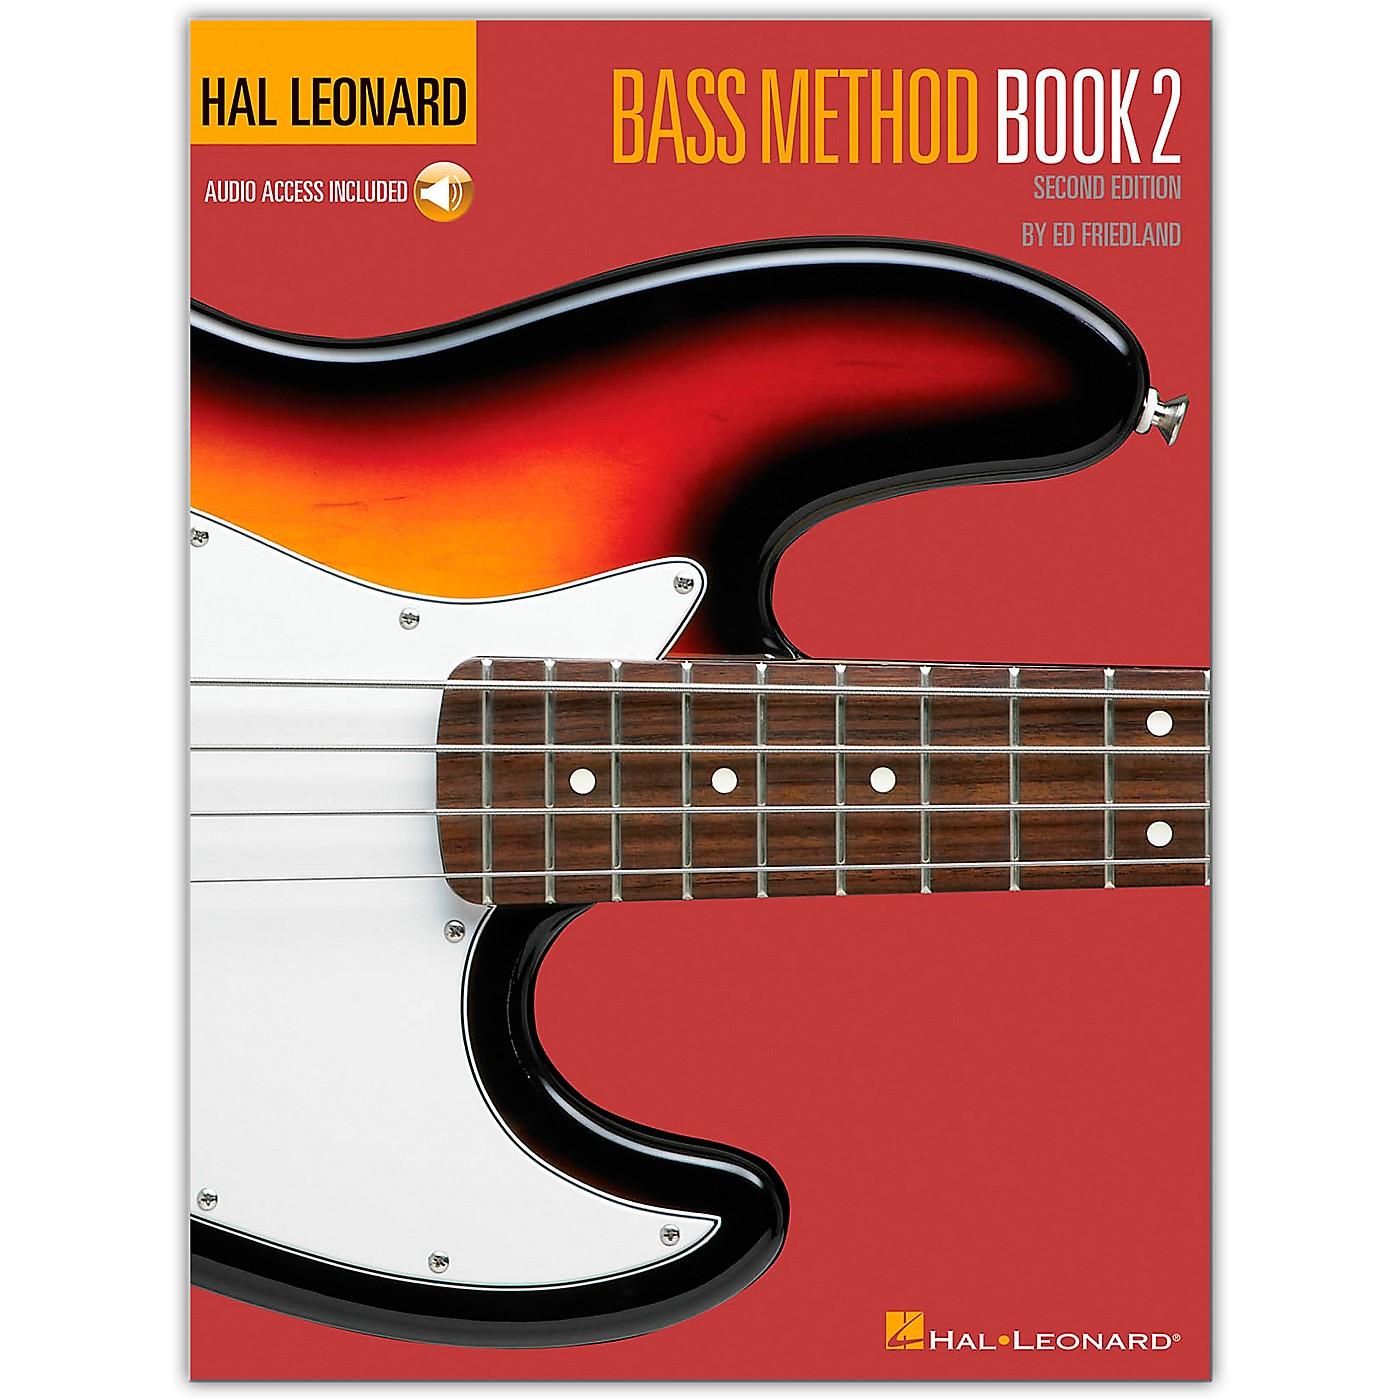 Hal Leonard Bass Method Book 2 - 2nd Edition (Book/Online Audio) thumbnail